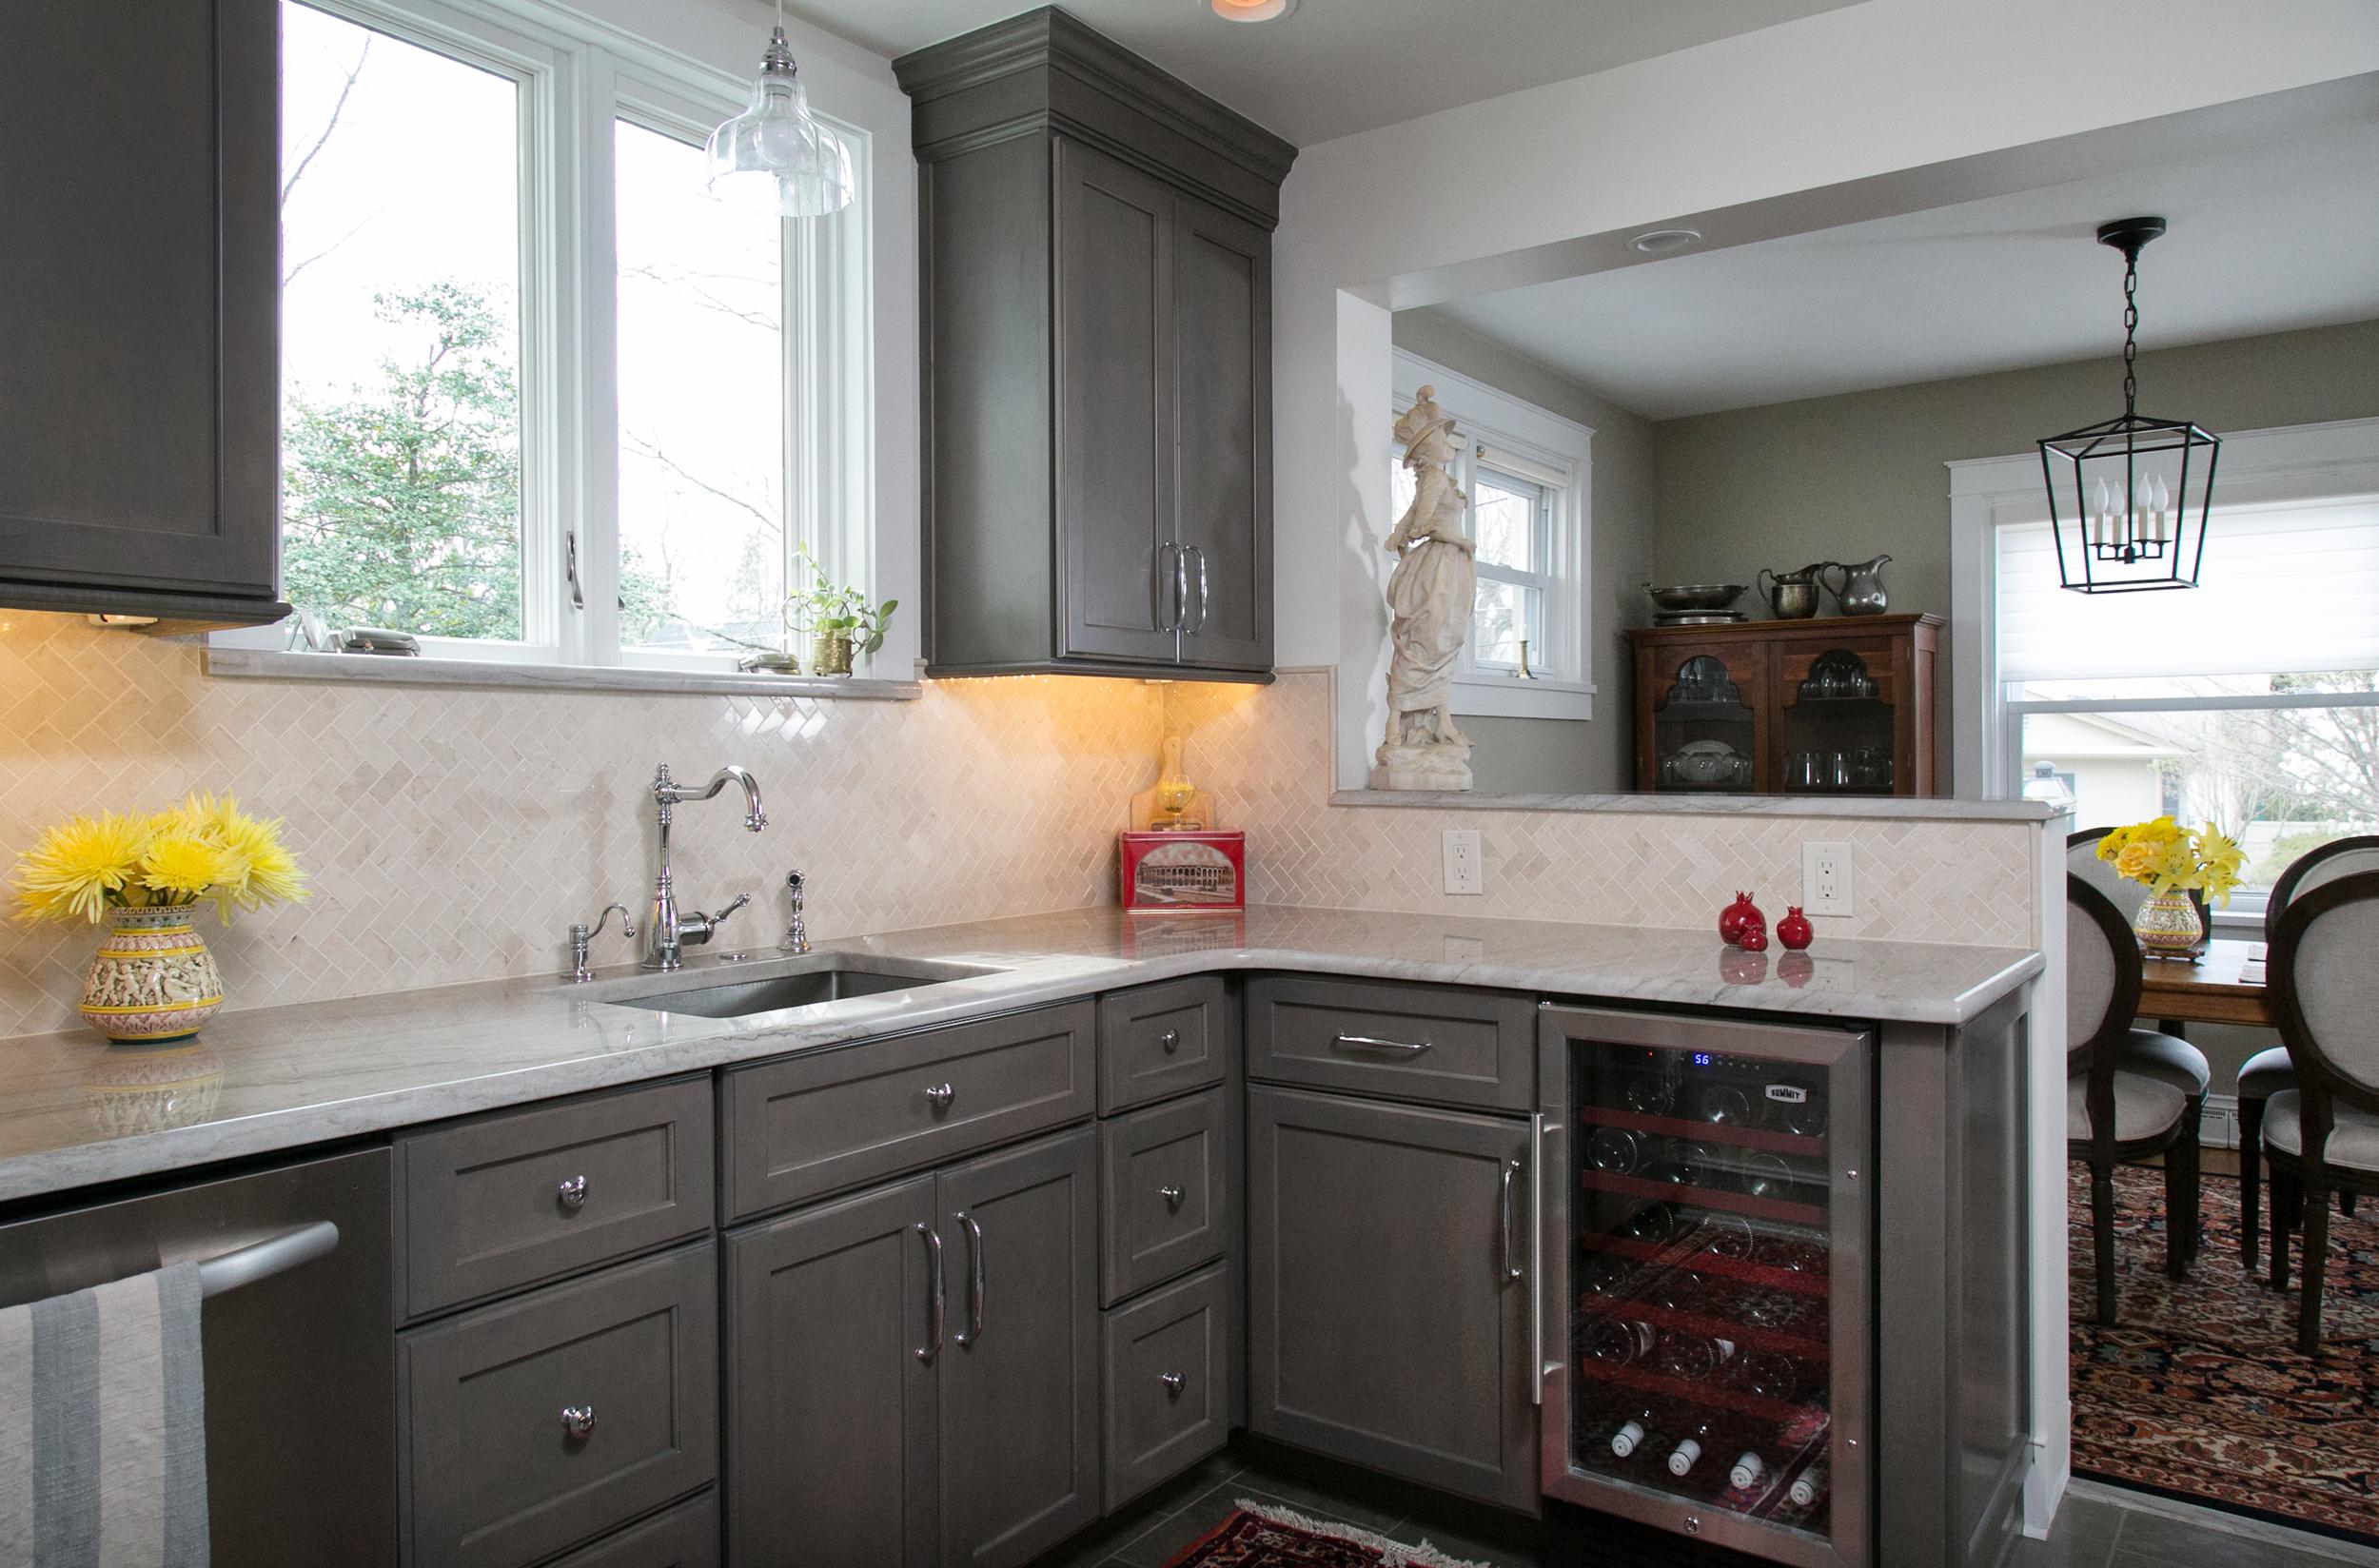 kitchen-remodel-chestnut-hill-pa